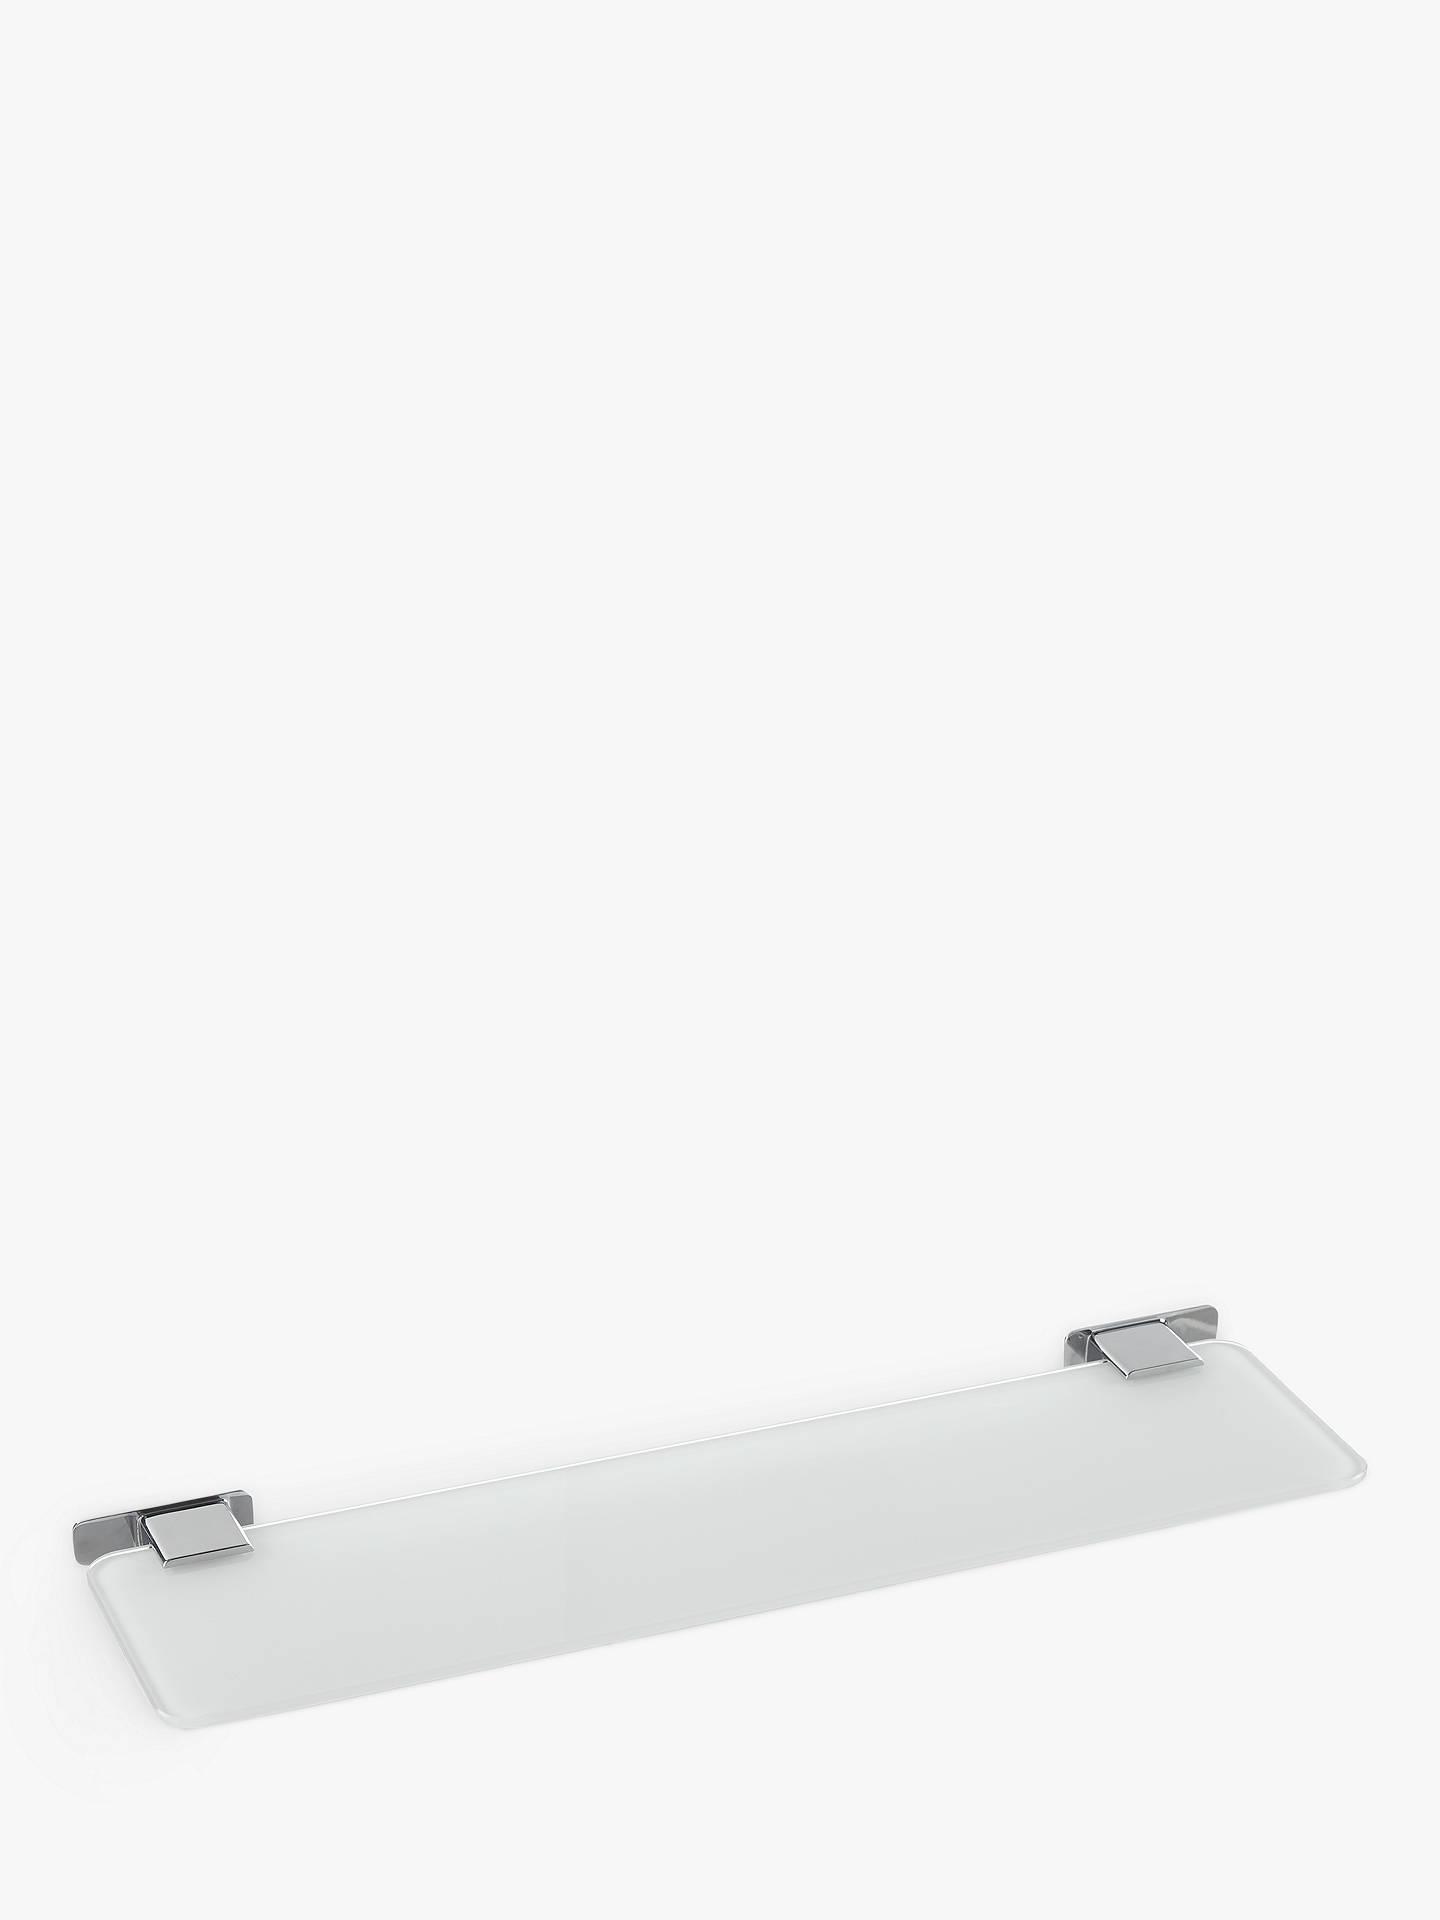 Buy House By John Lewis Form Glass Bathroom Shelf Online At Johnlewis.com  ...